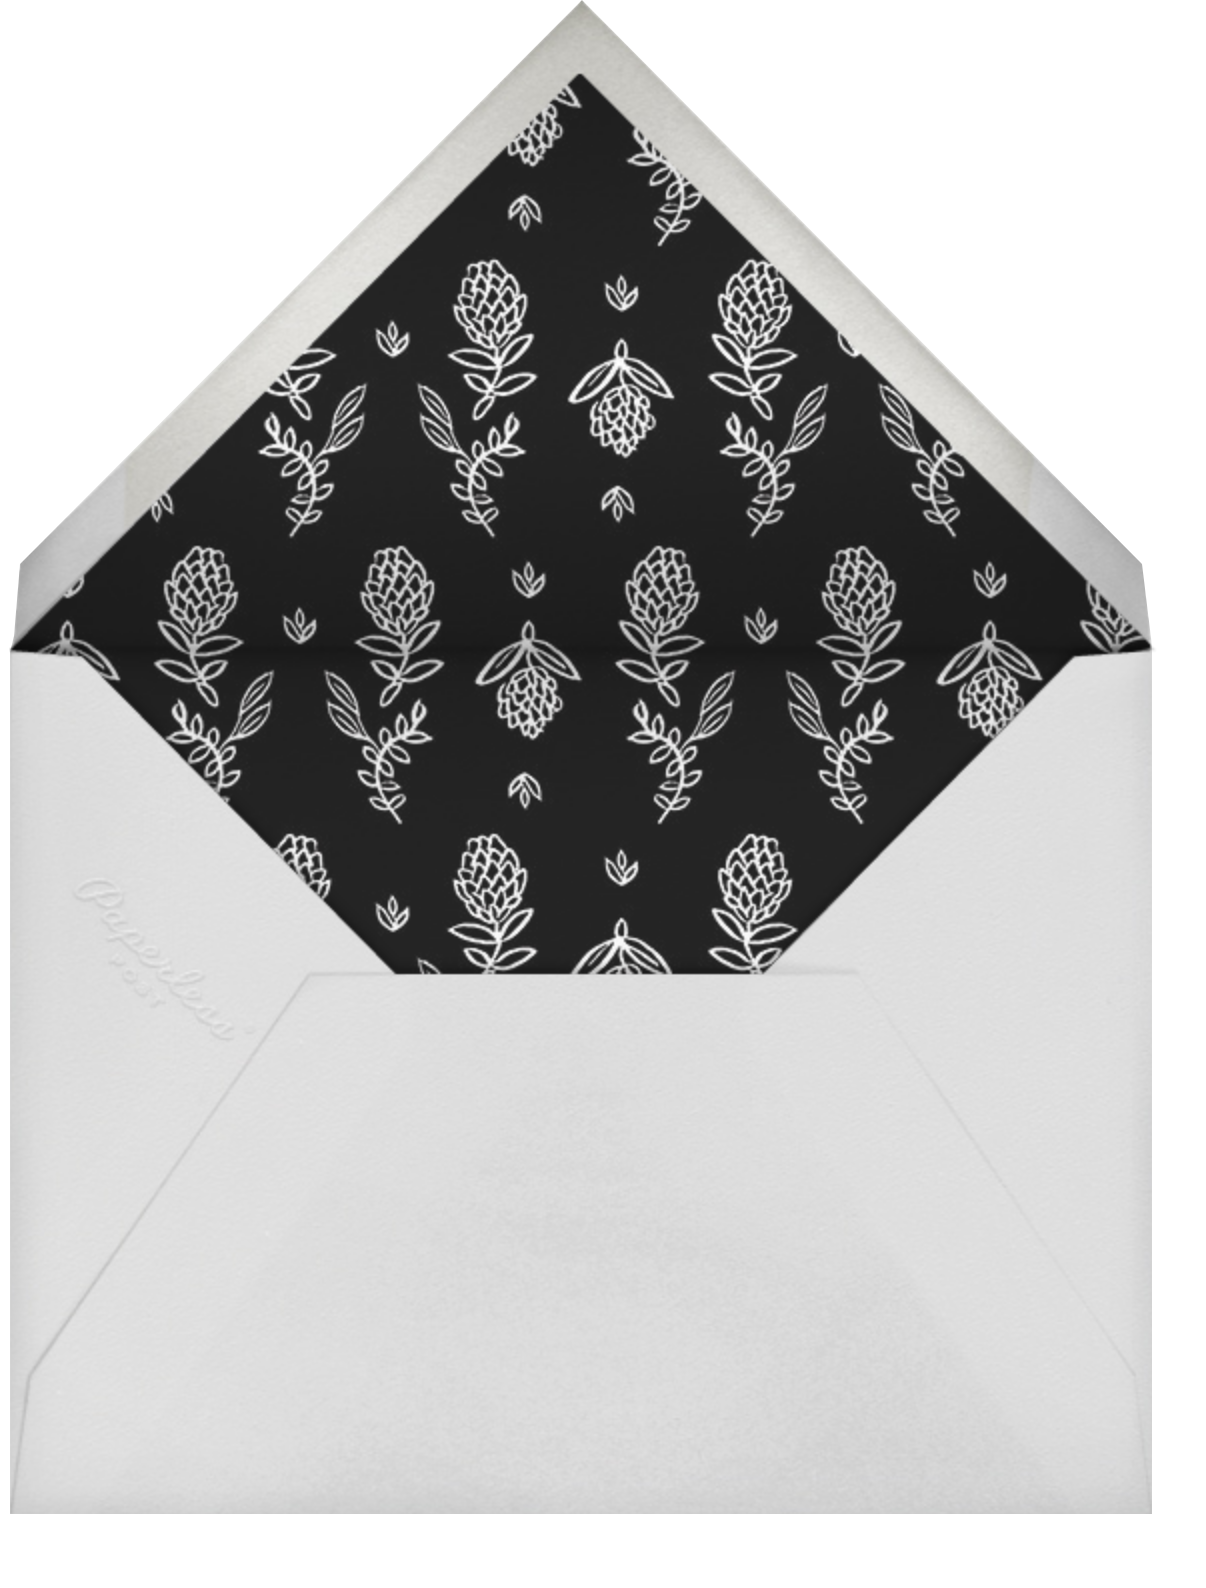 Botanical Lace (Photo) - Gold - Rifle Paper Co. - Graduation party - envelope back